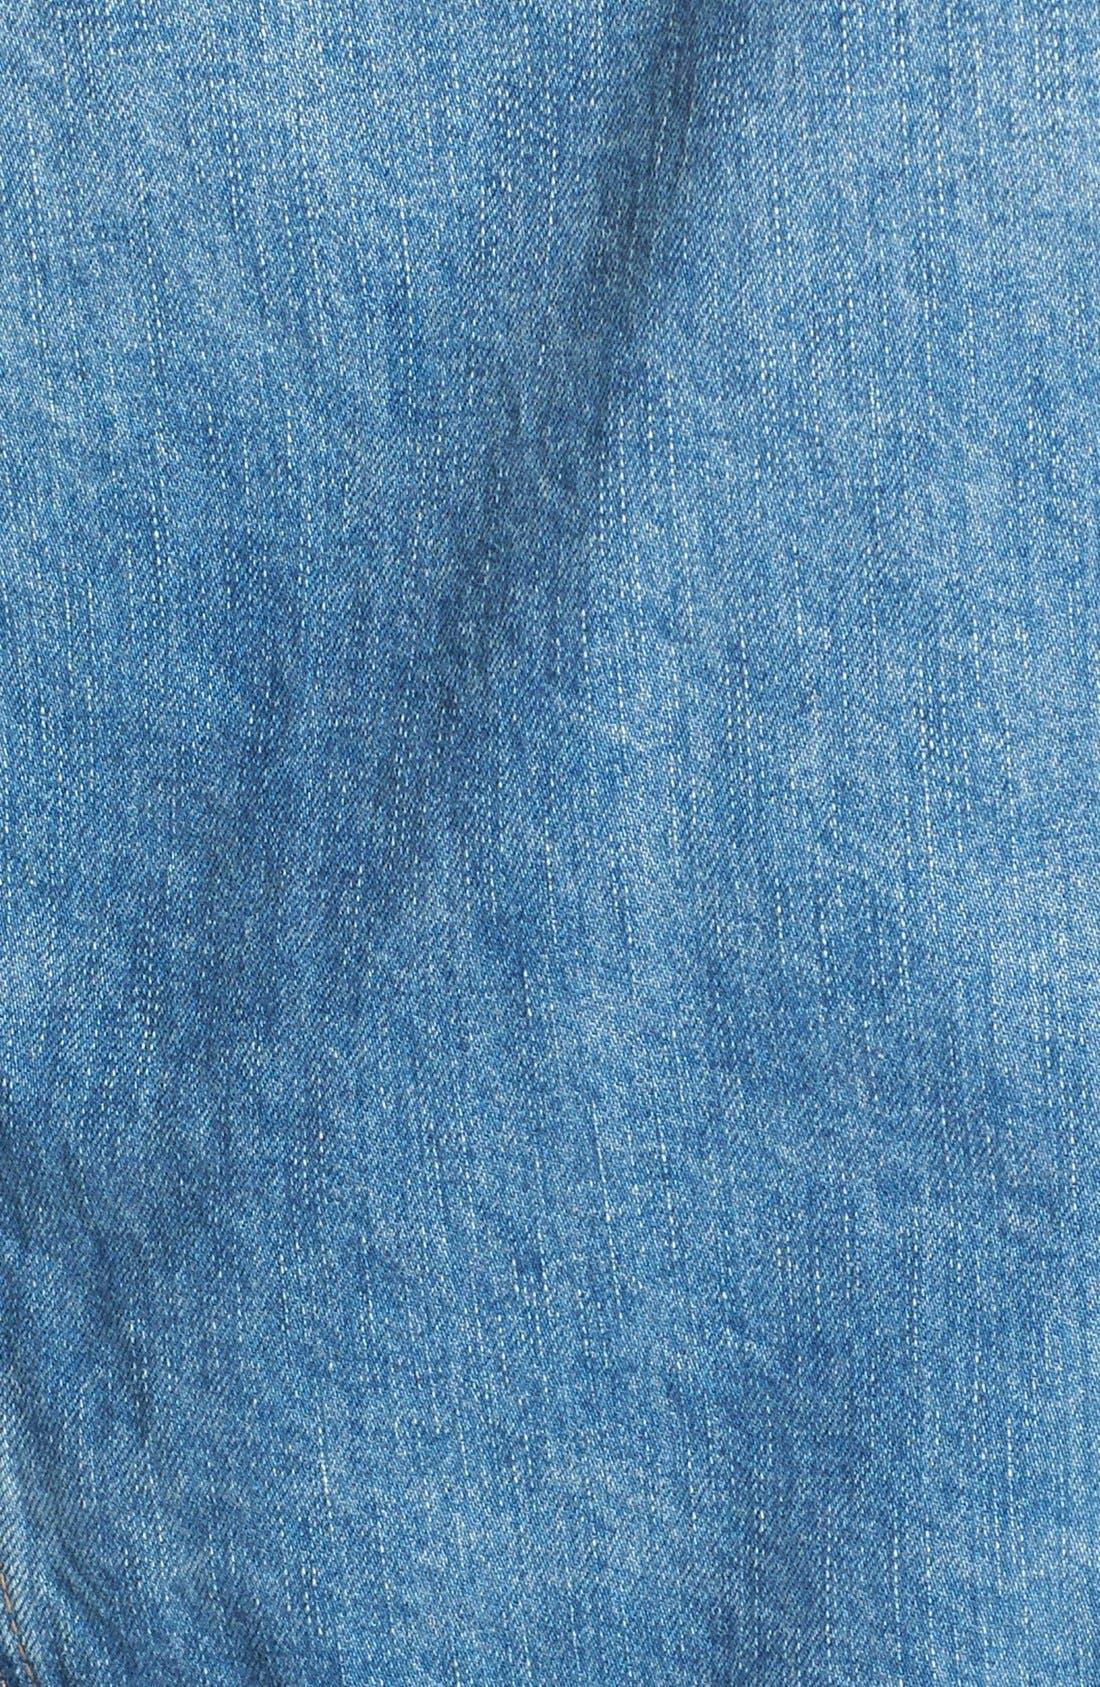 Alternate Image 3  - BLANKNYC Mixed Media Denim Jacket